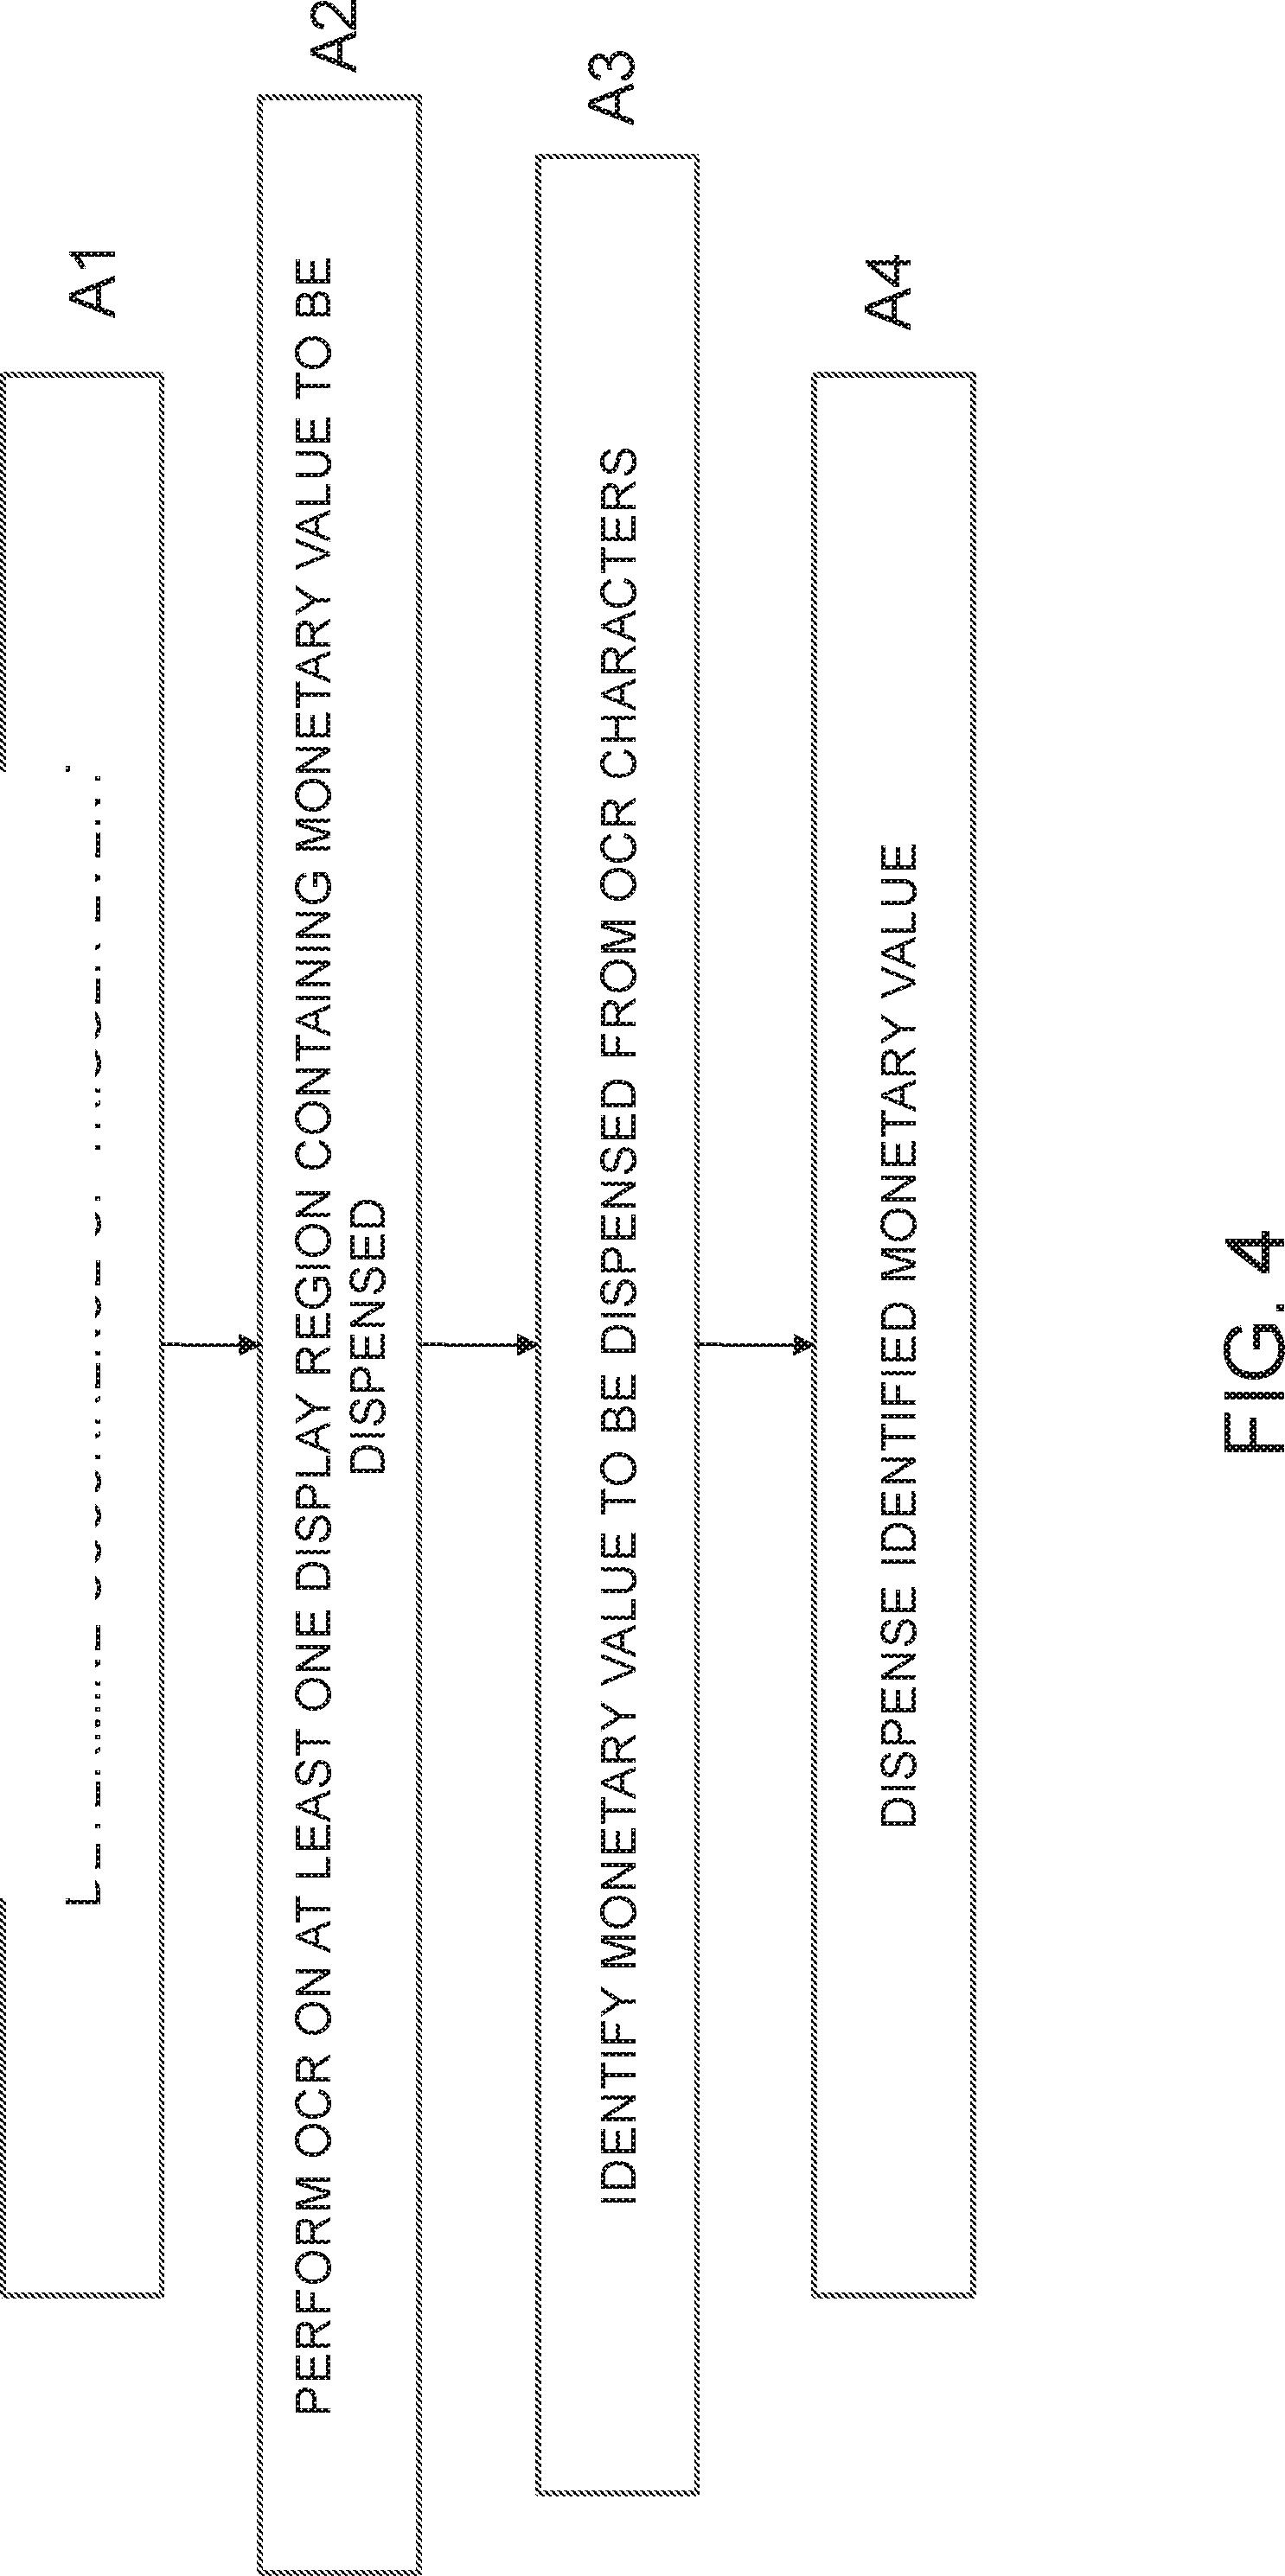 Figure GB2557237A_D0008